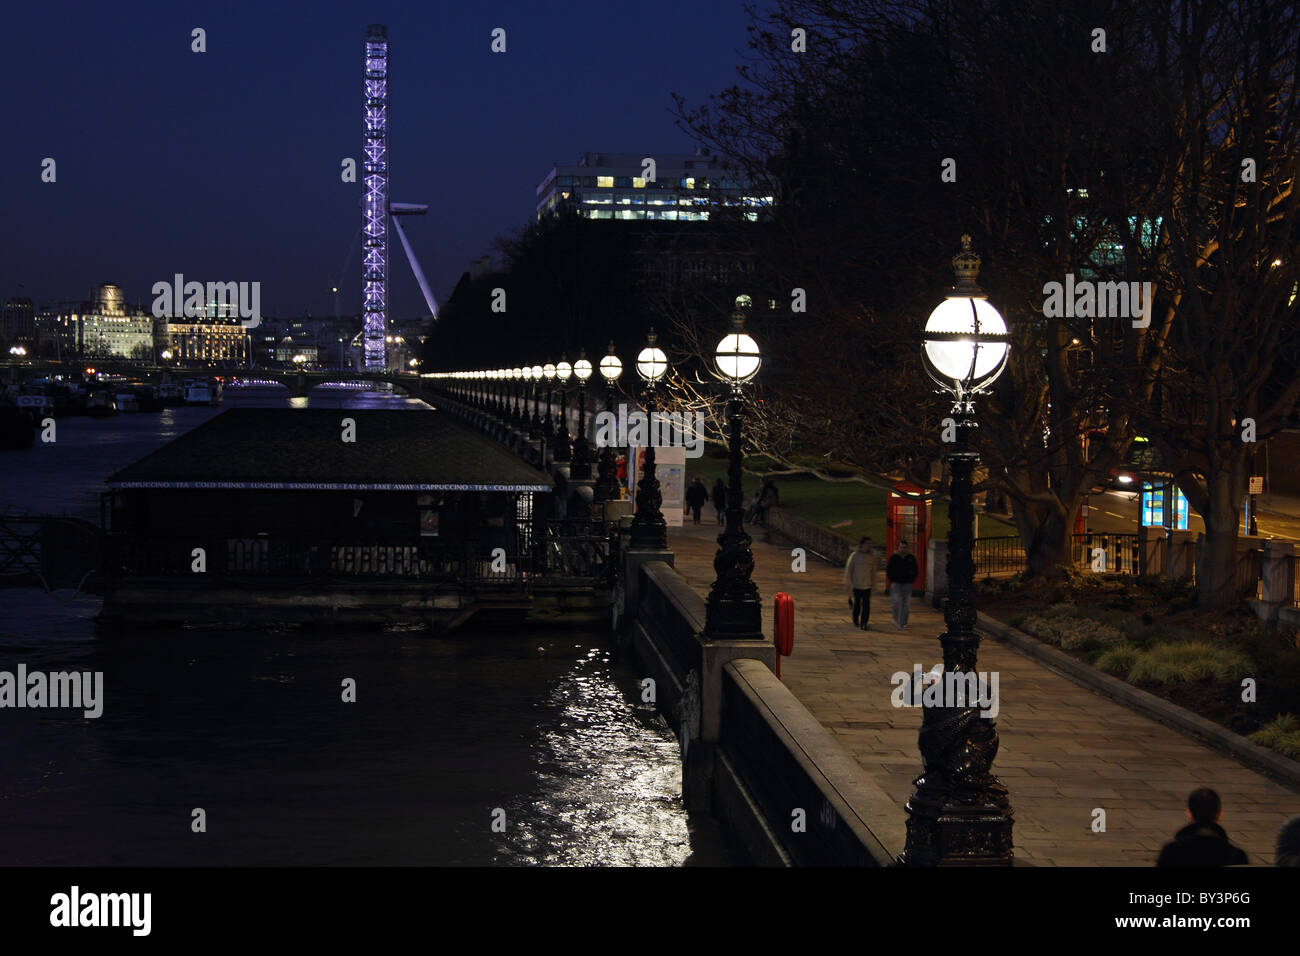 London Eye night embankment street lights lamps - Stock Image